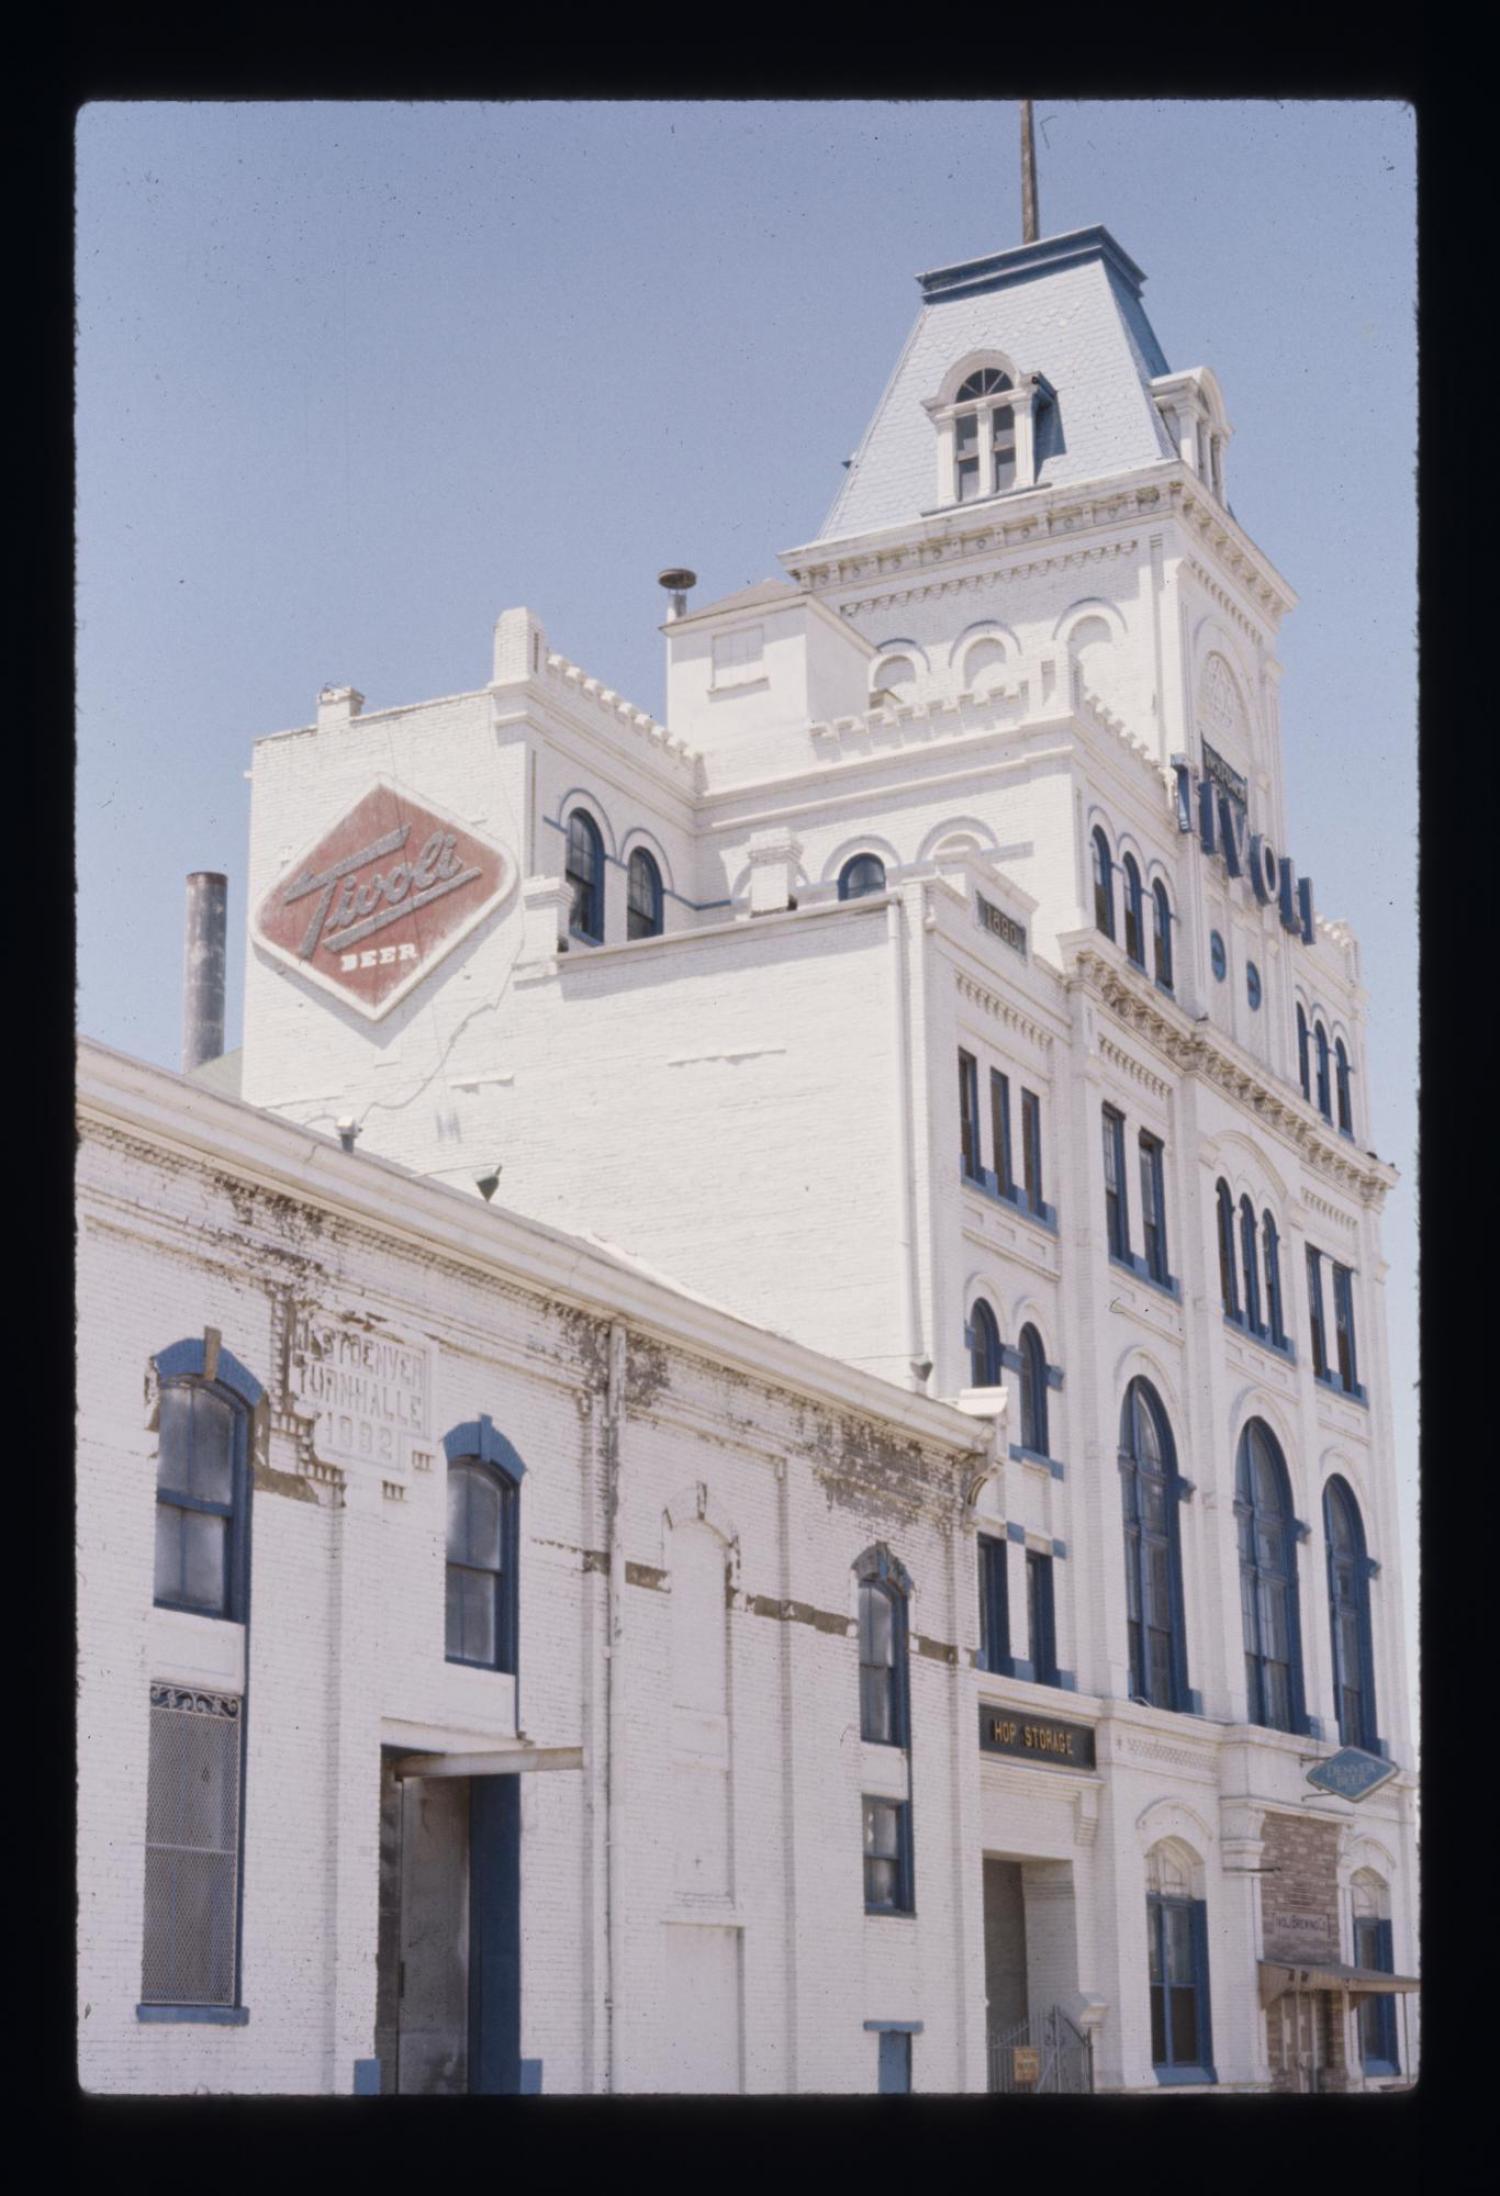 historic photo of Tivoli Student Union